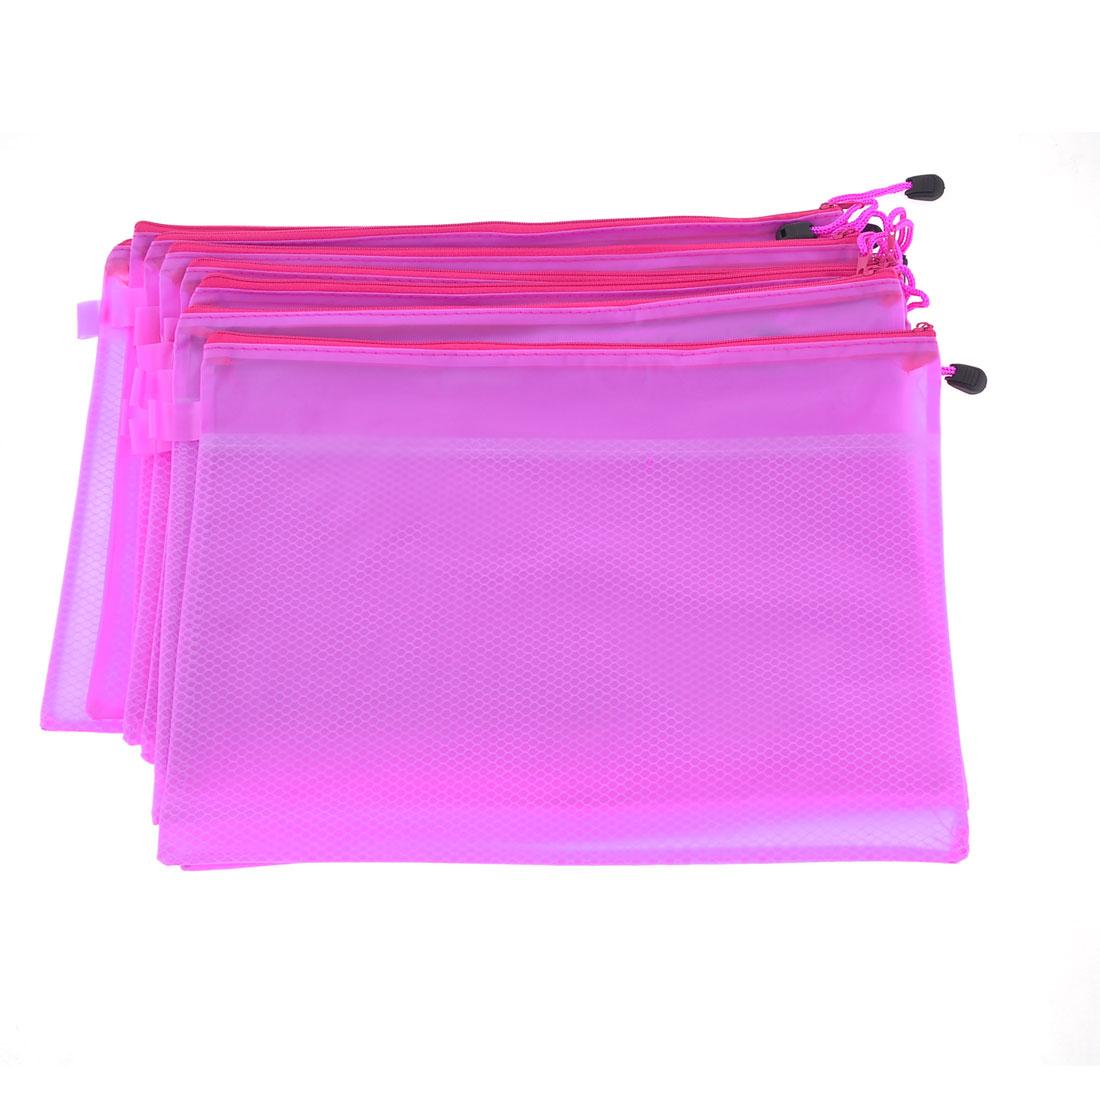 10 Pcs Two Compartments Zippered PVC A4 Paper File Folder Bags Light Purple